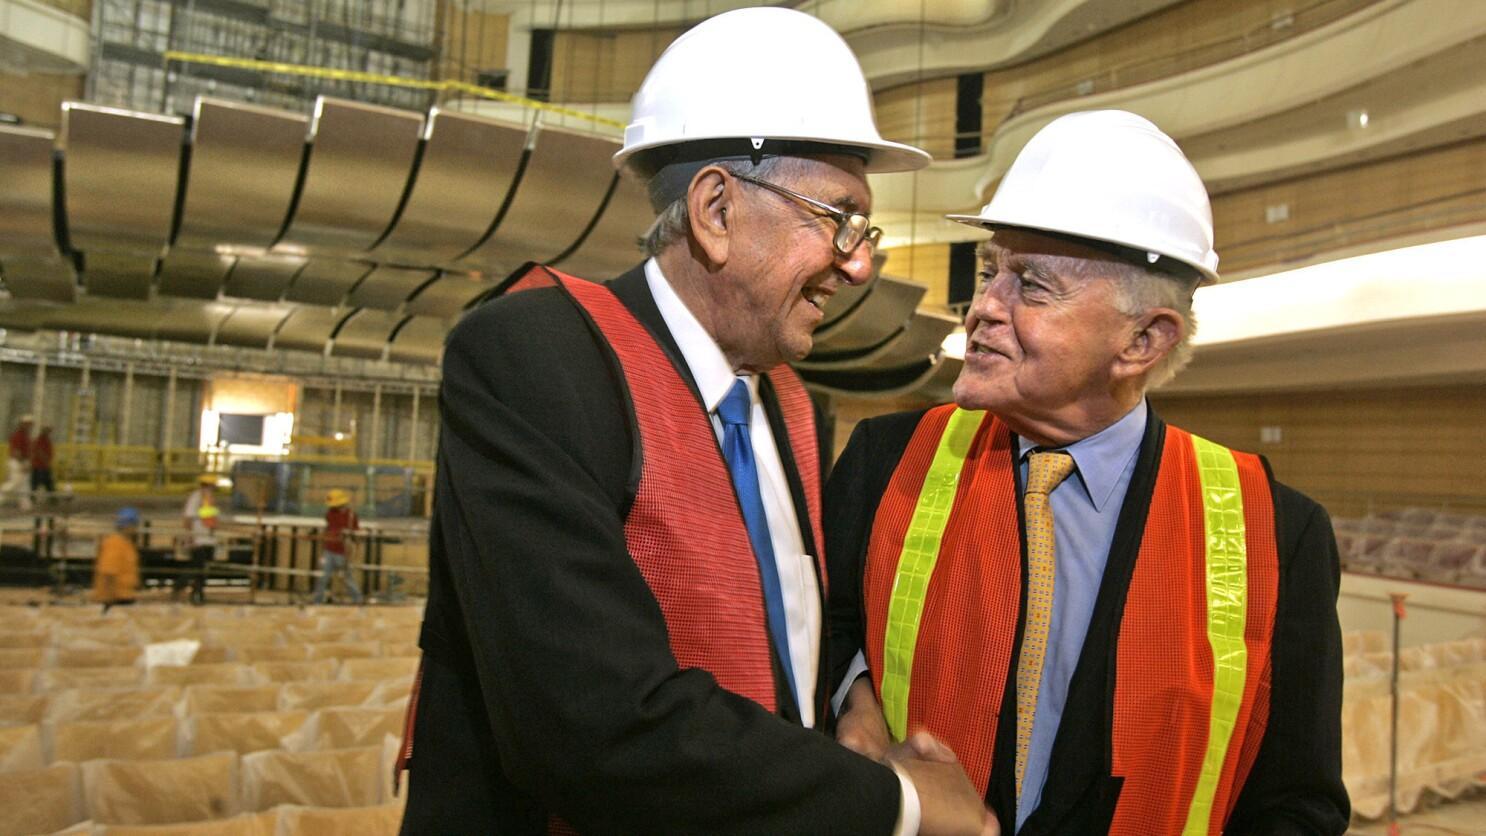 Cesar Pelli, U.S. architect who altered skylines, dies at 92